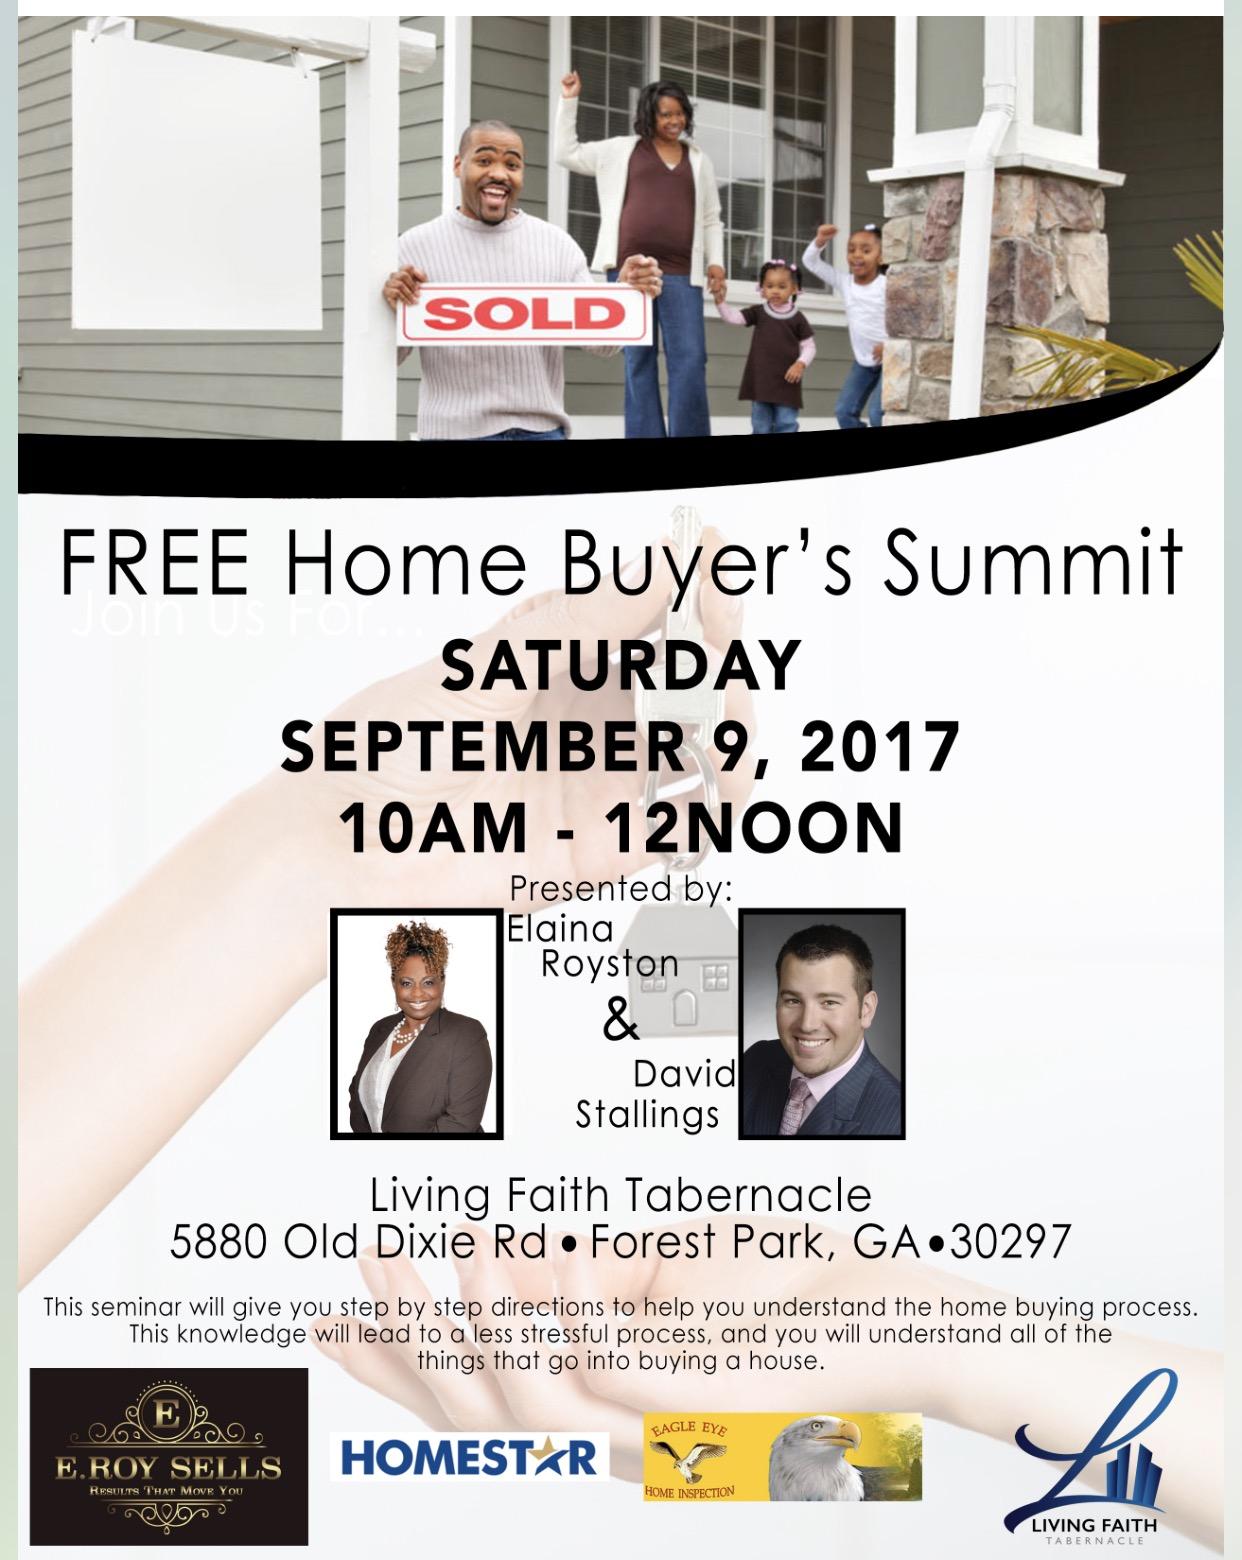 Free Home Buyer's Summit